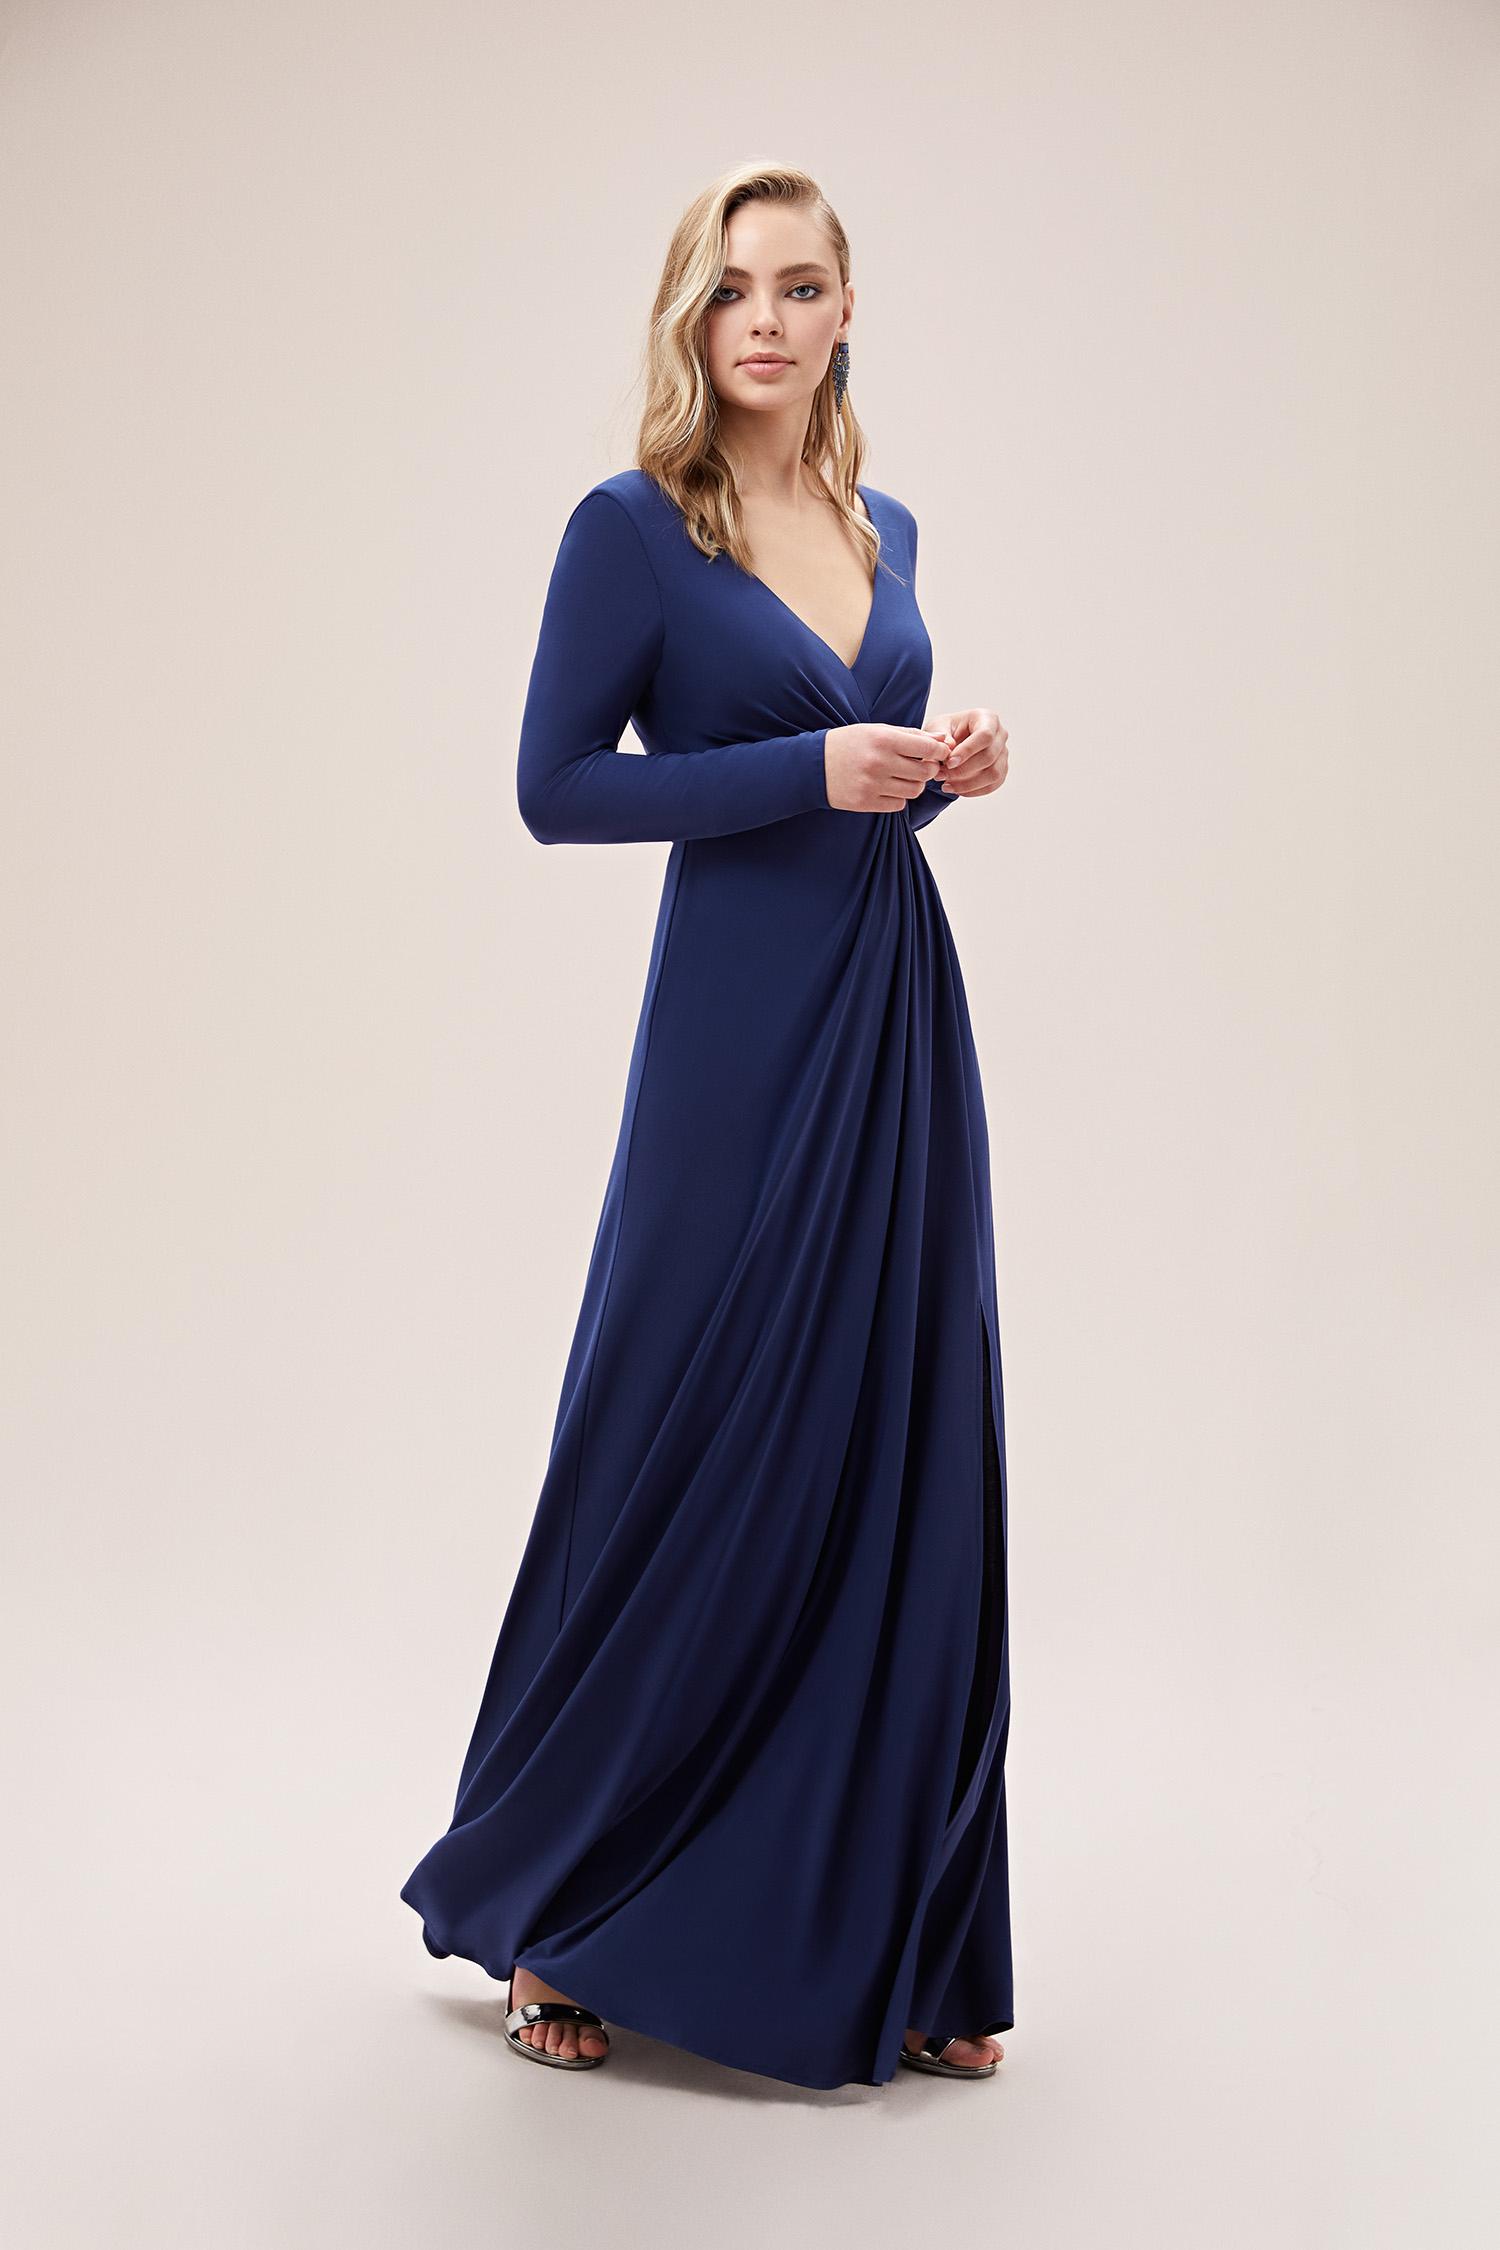 Gece Mavisi Uzun Kollu V Yaka Uzun Jarse Elbise - Thumbnail